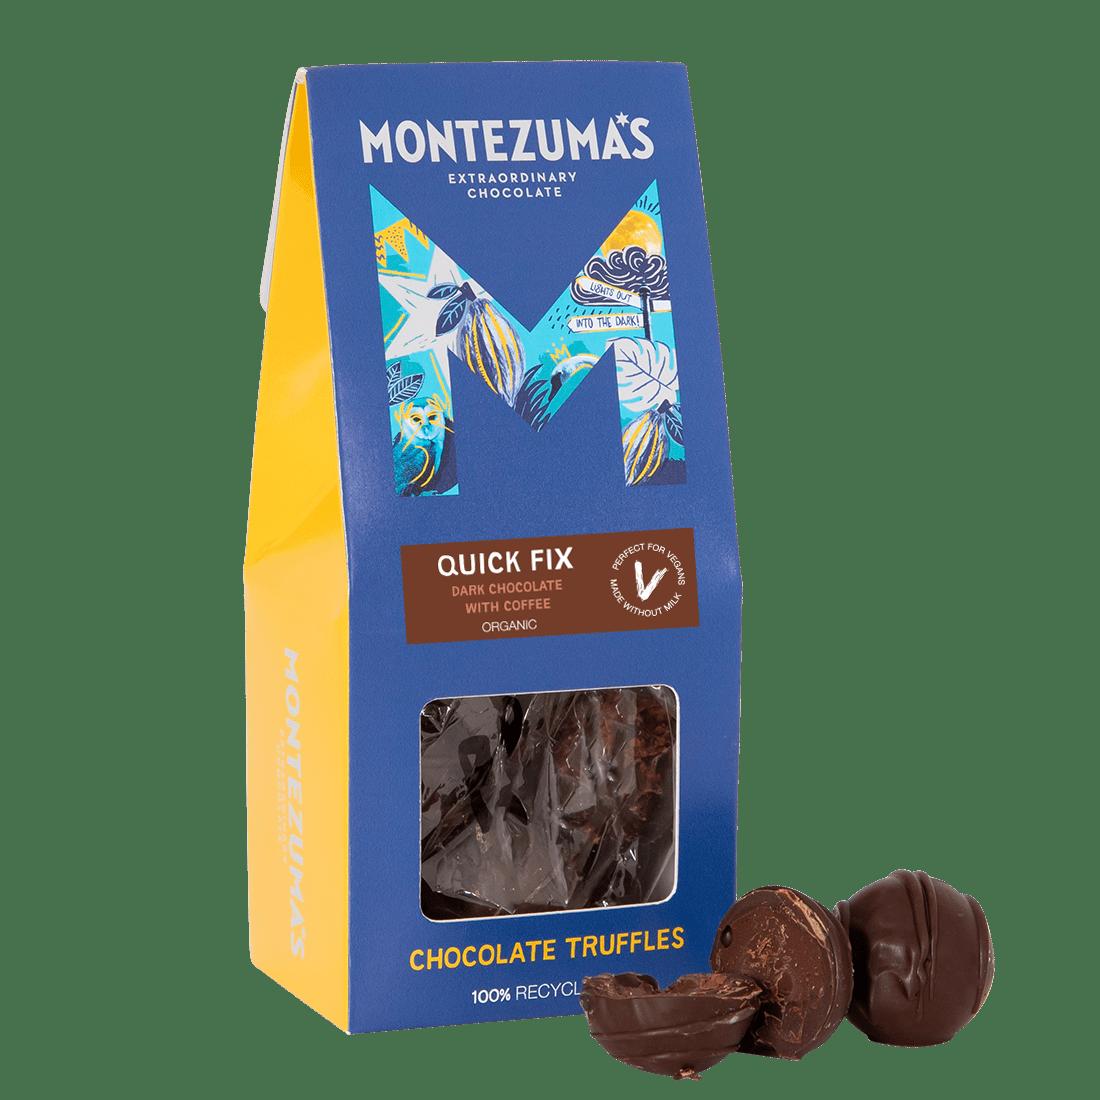 Quick Fix - Organic & Vegan Dark Chocolate Truffles with Coffee